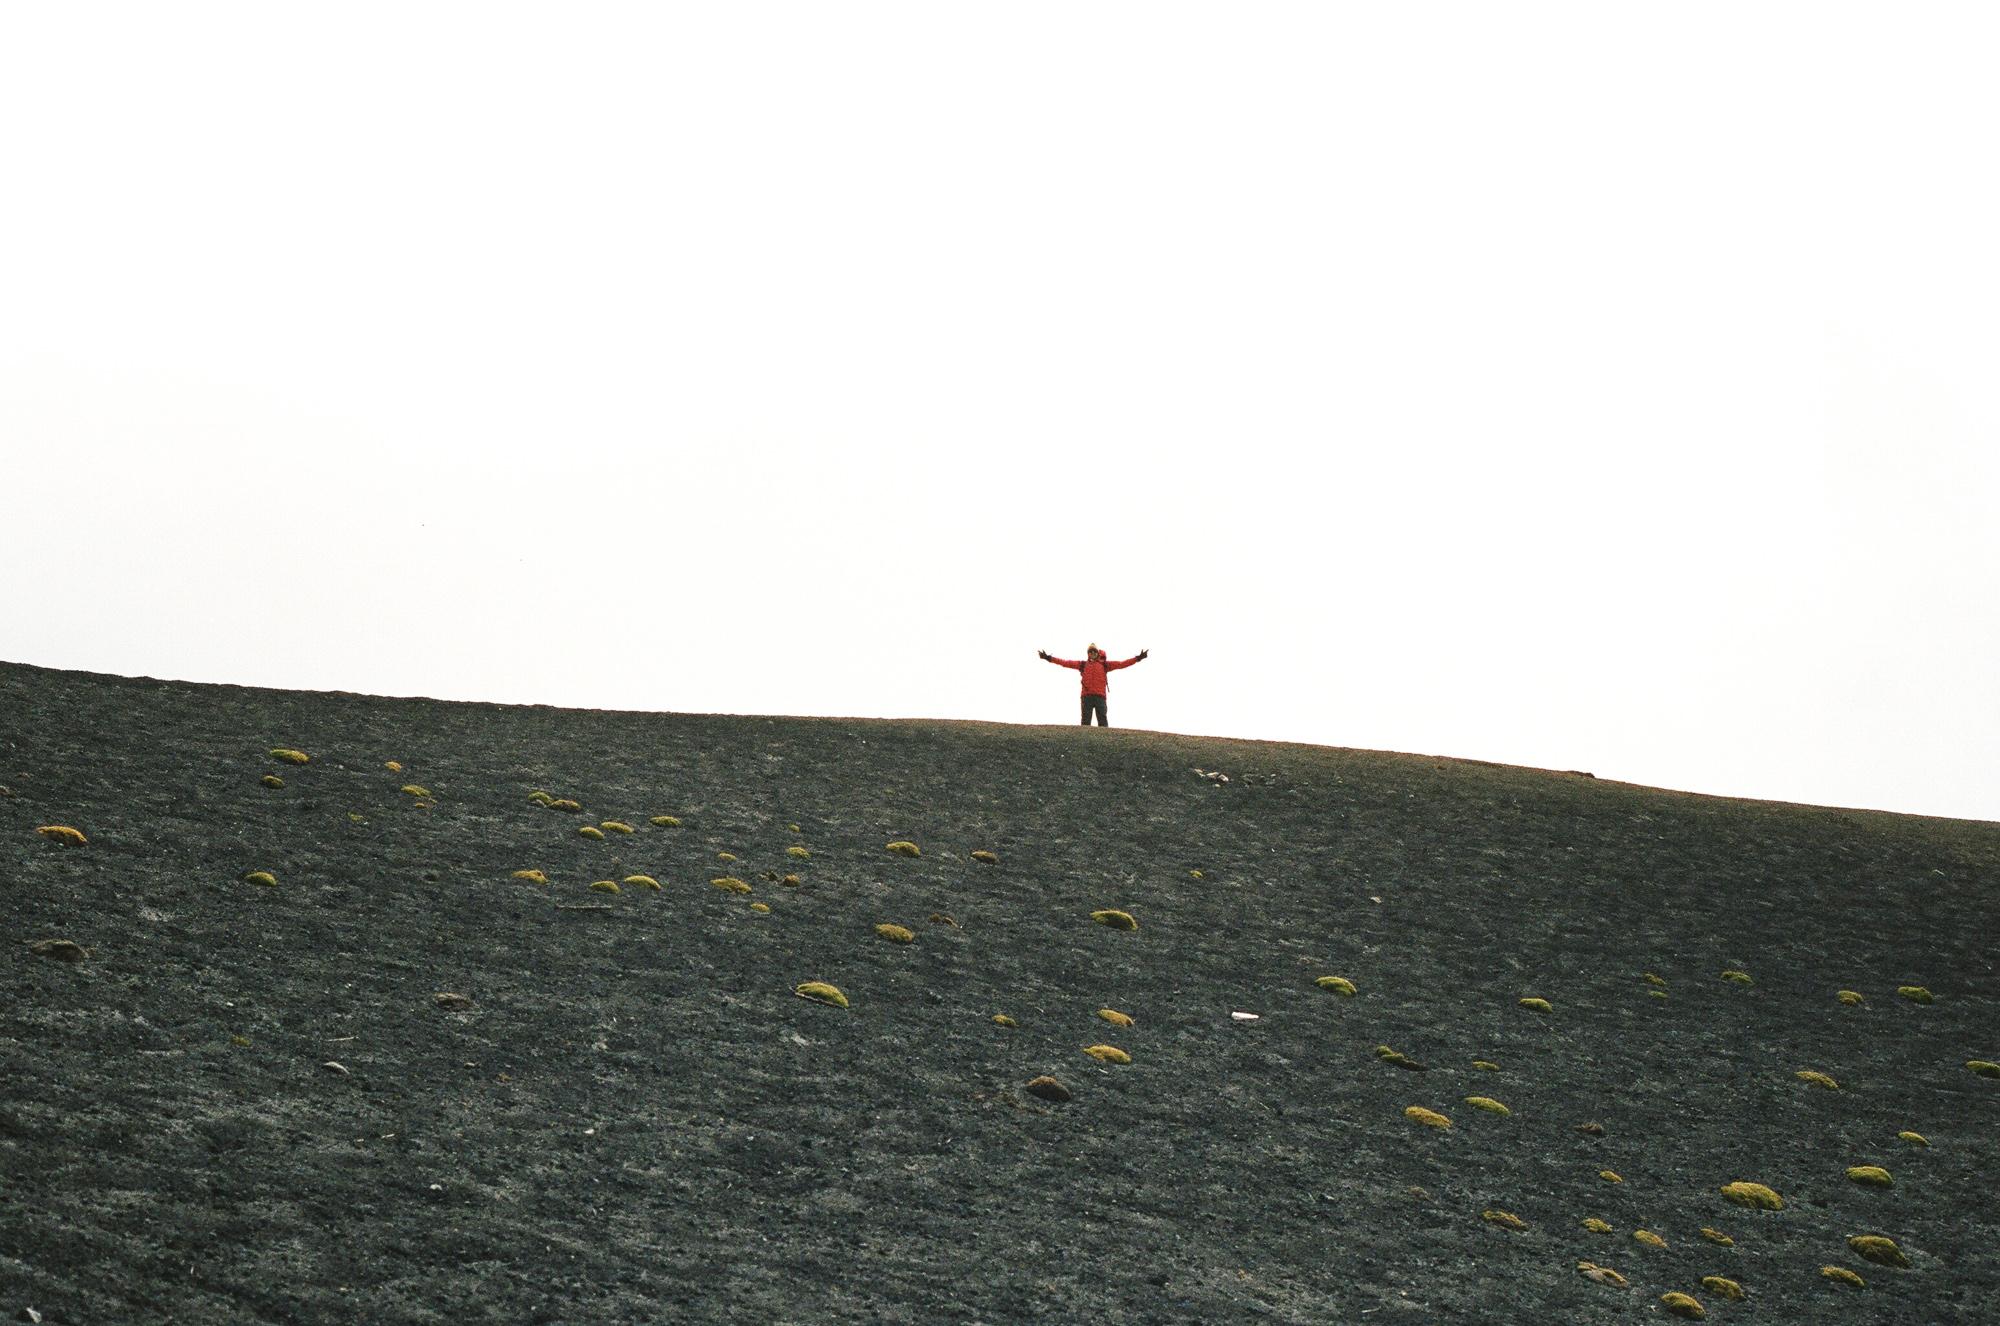 Volcán Acatenango, Guatemala  February 2018